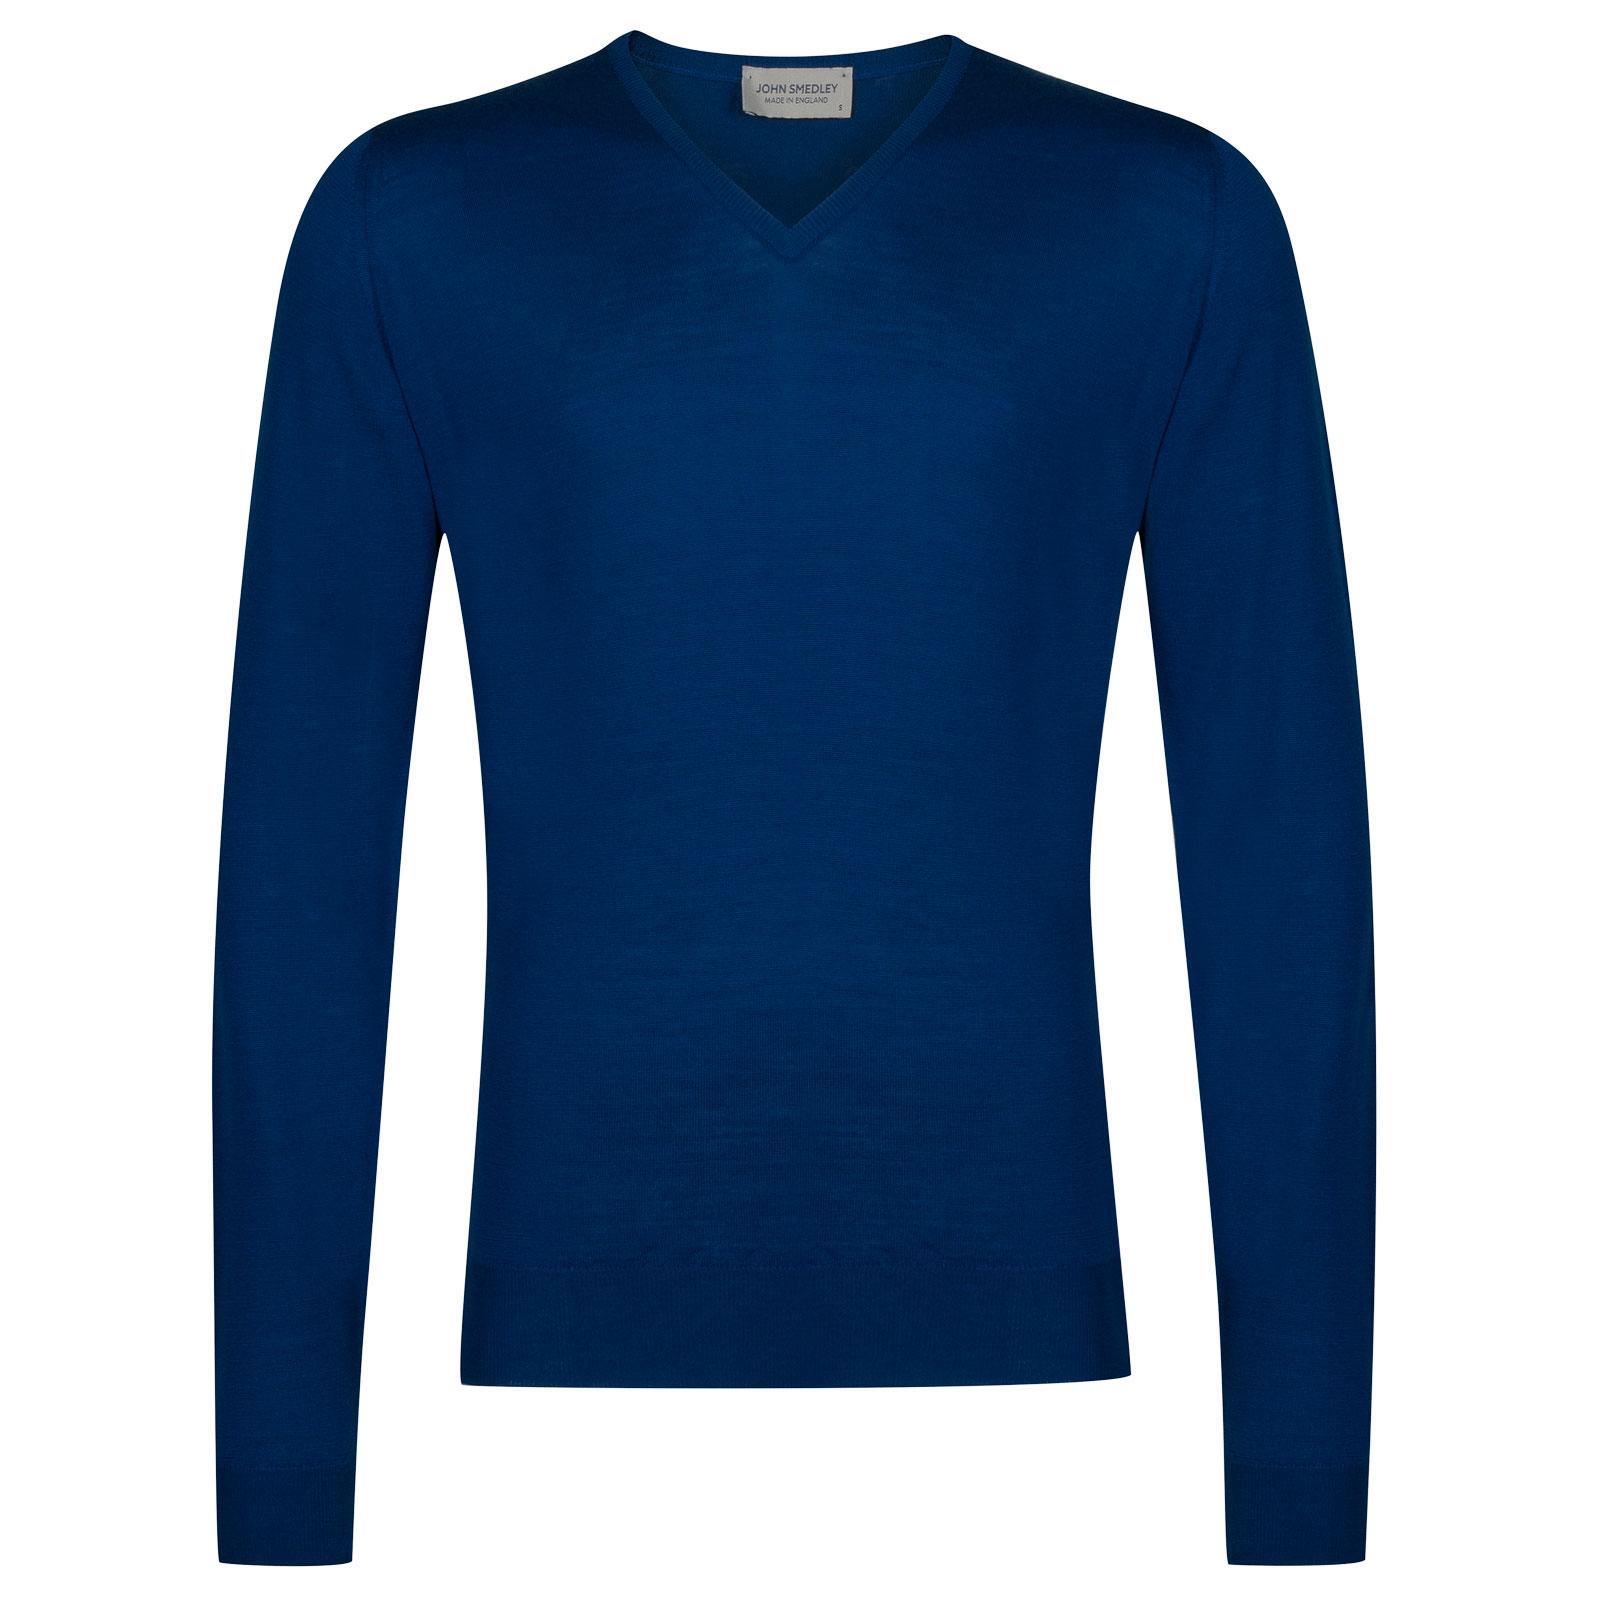 Blenheim-breton-blue-L